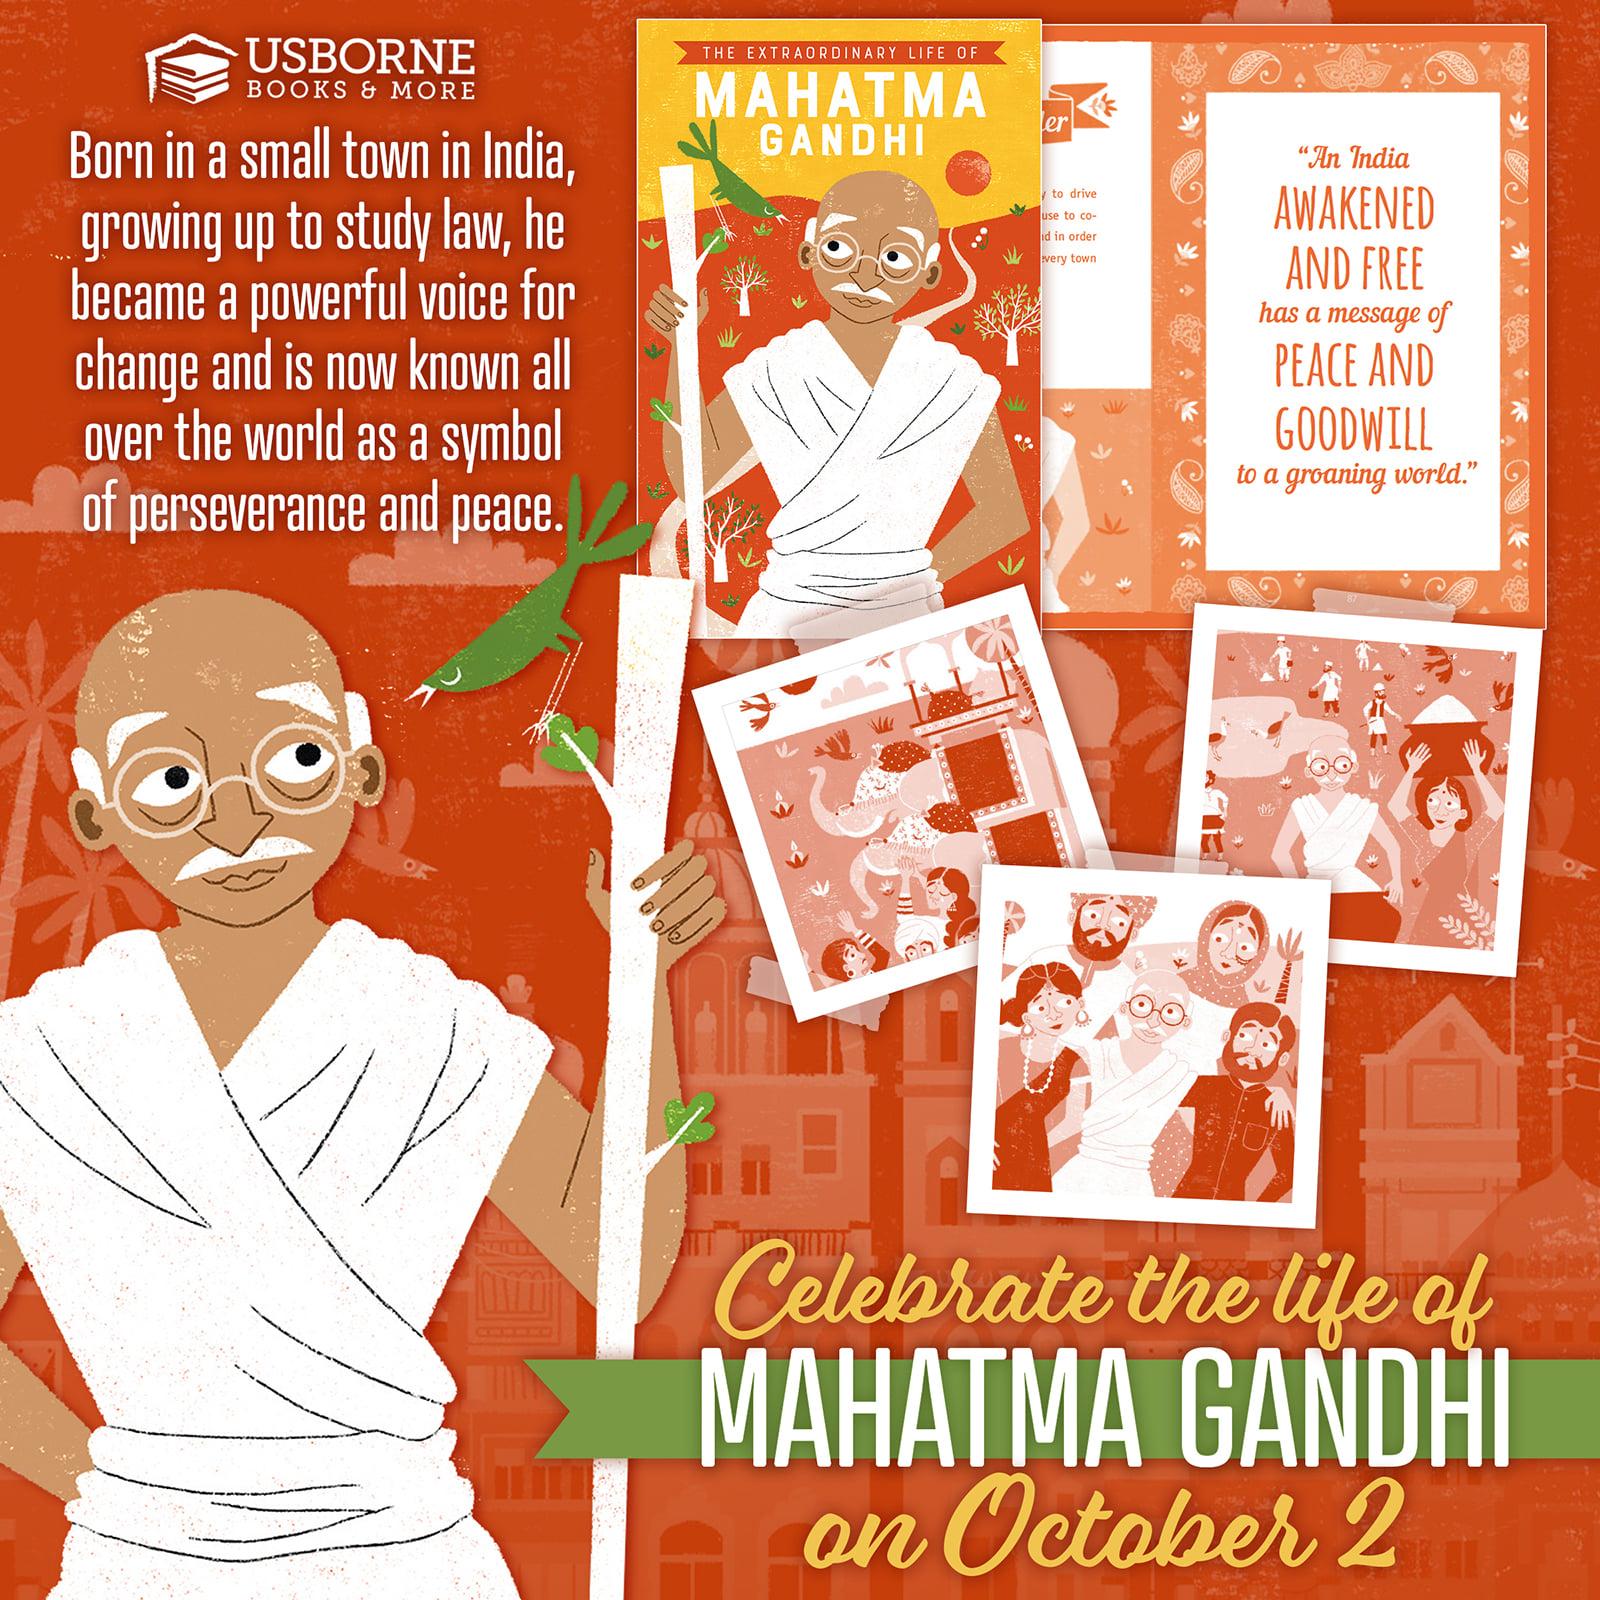 Celebrate the extraordinary life of Mahatma Gandhi ~ October 2